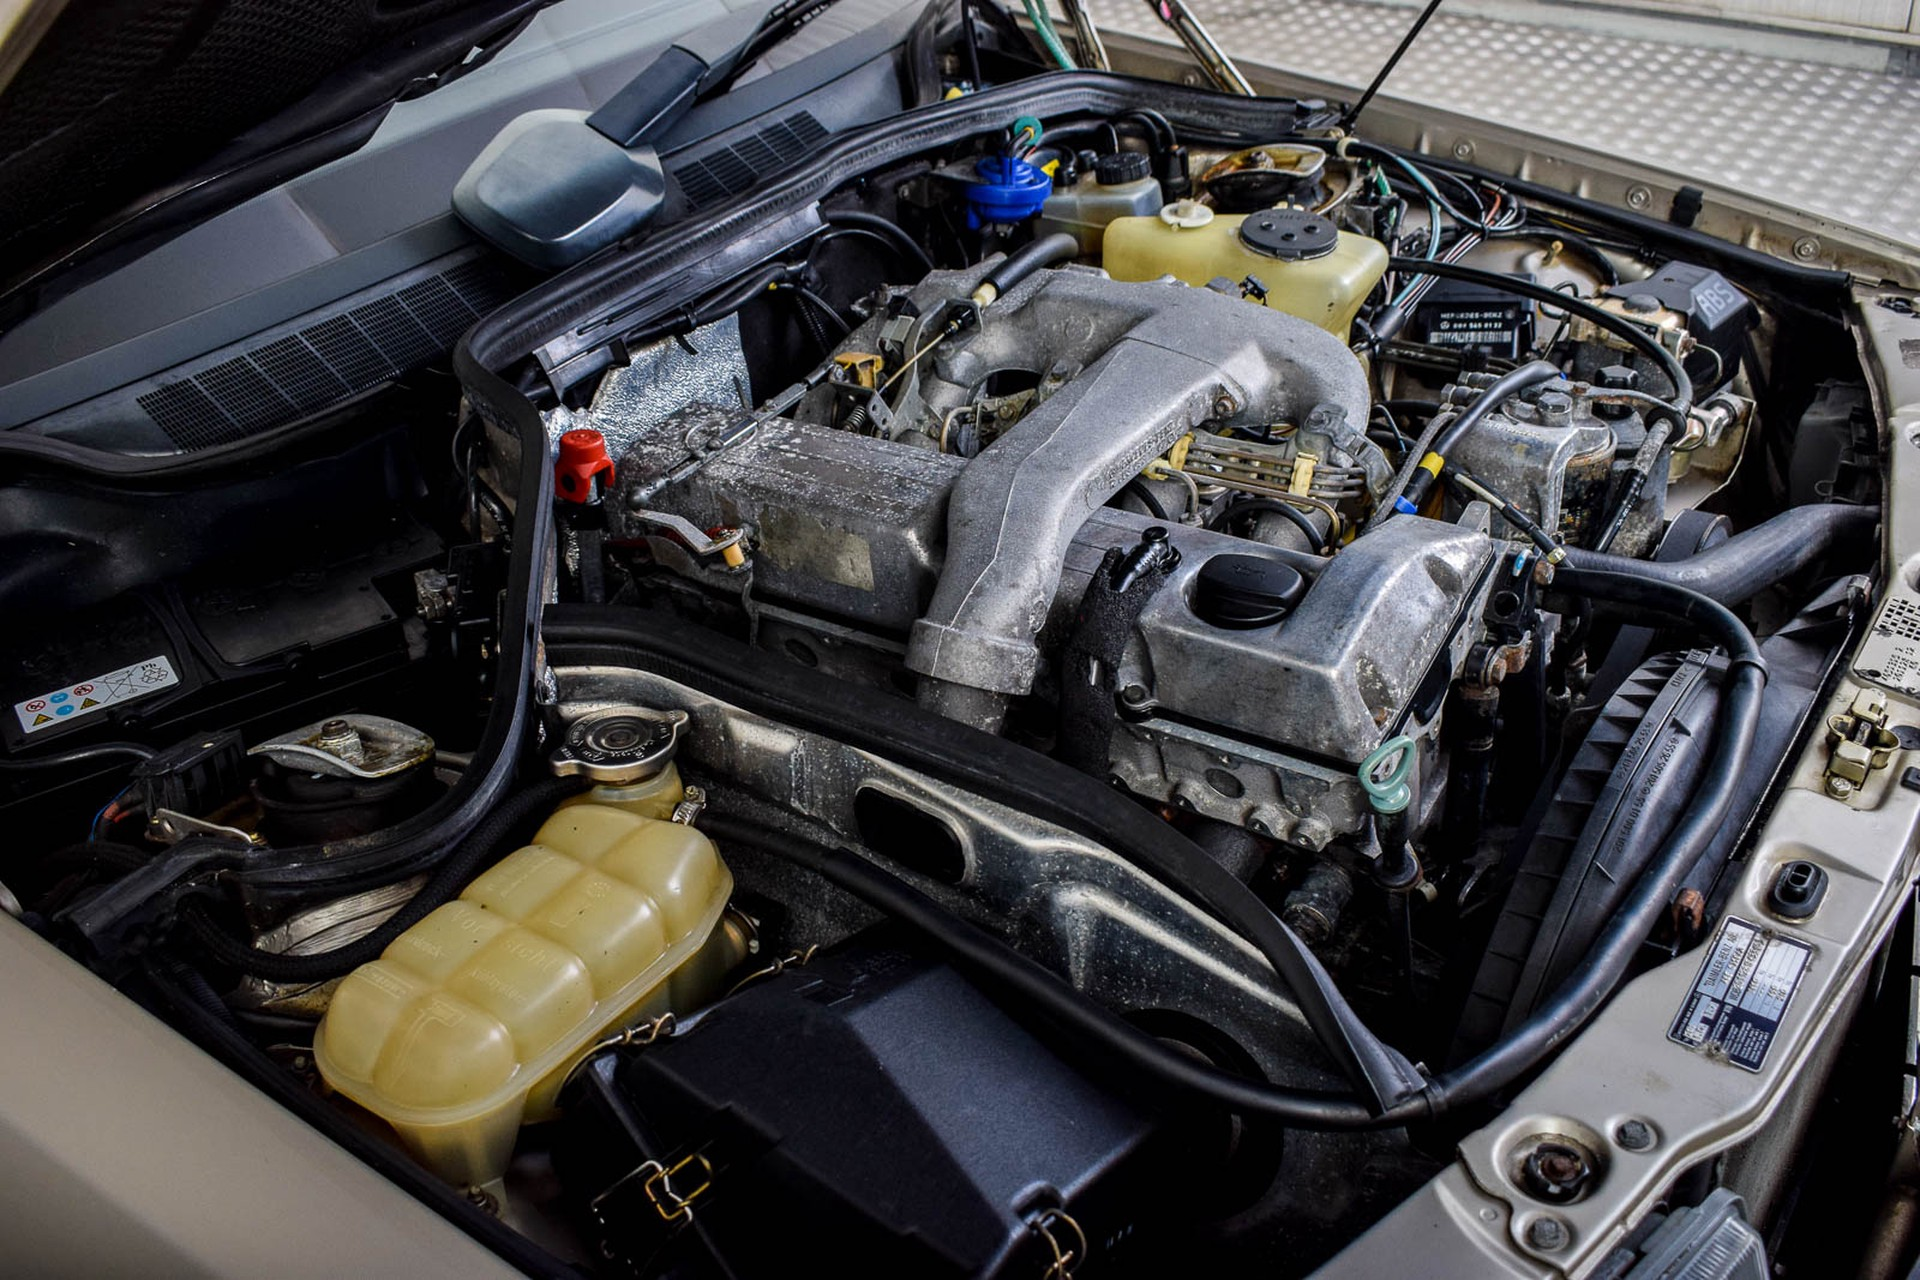 Mercedes-Benz 190 2.5 D Turbo Diesel Foto 52